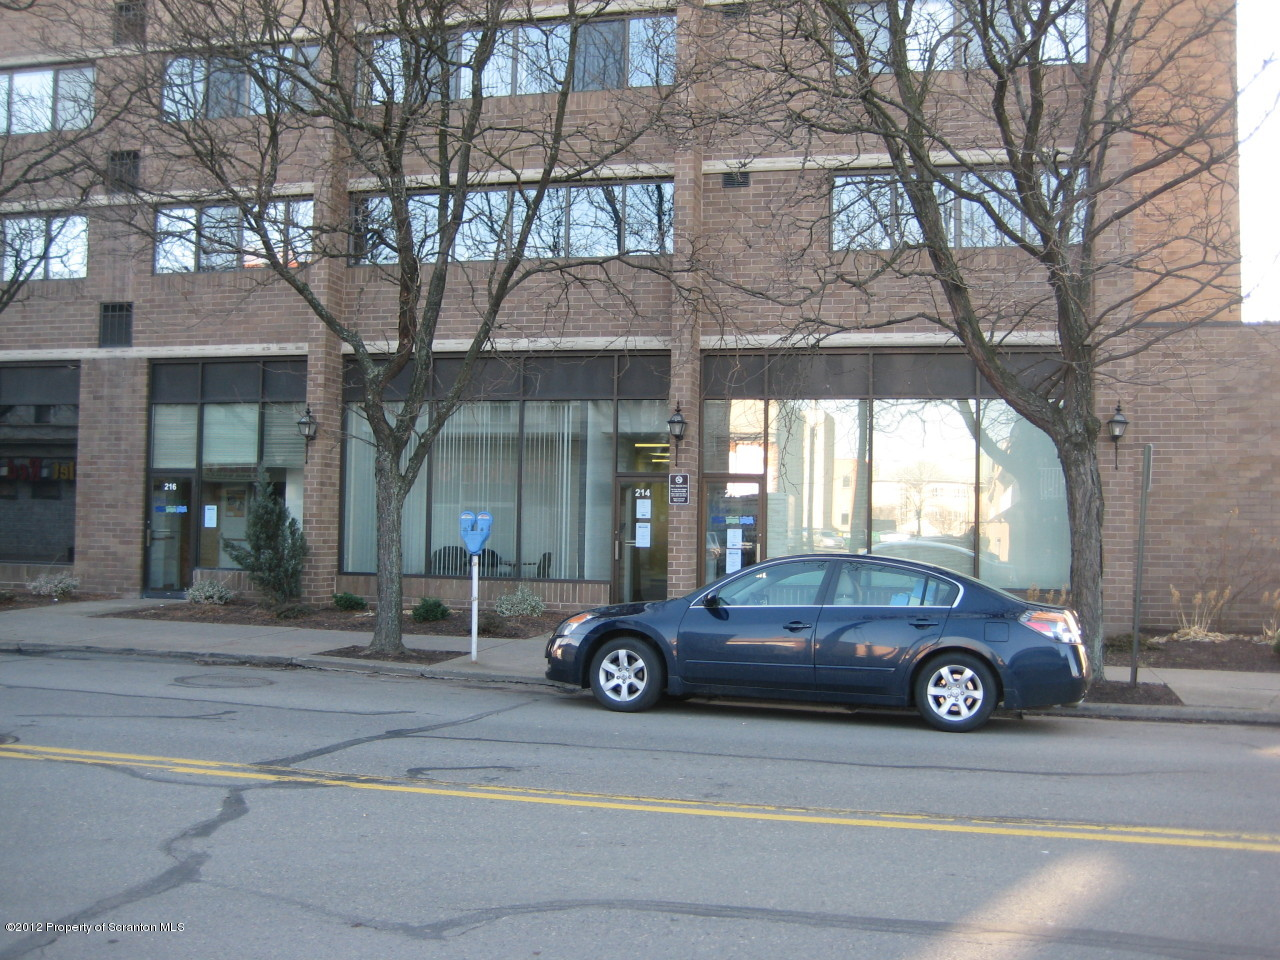 212-216 Linden St, Scranton, Pennsylvania 18503, ,3 BathroomsBathrooms,Commercial,For Sale,Linden,12-5474